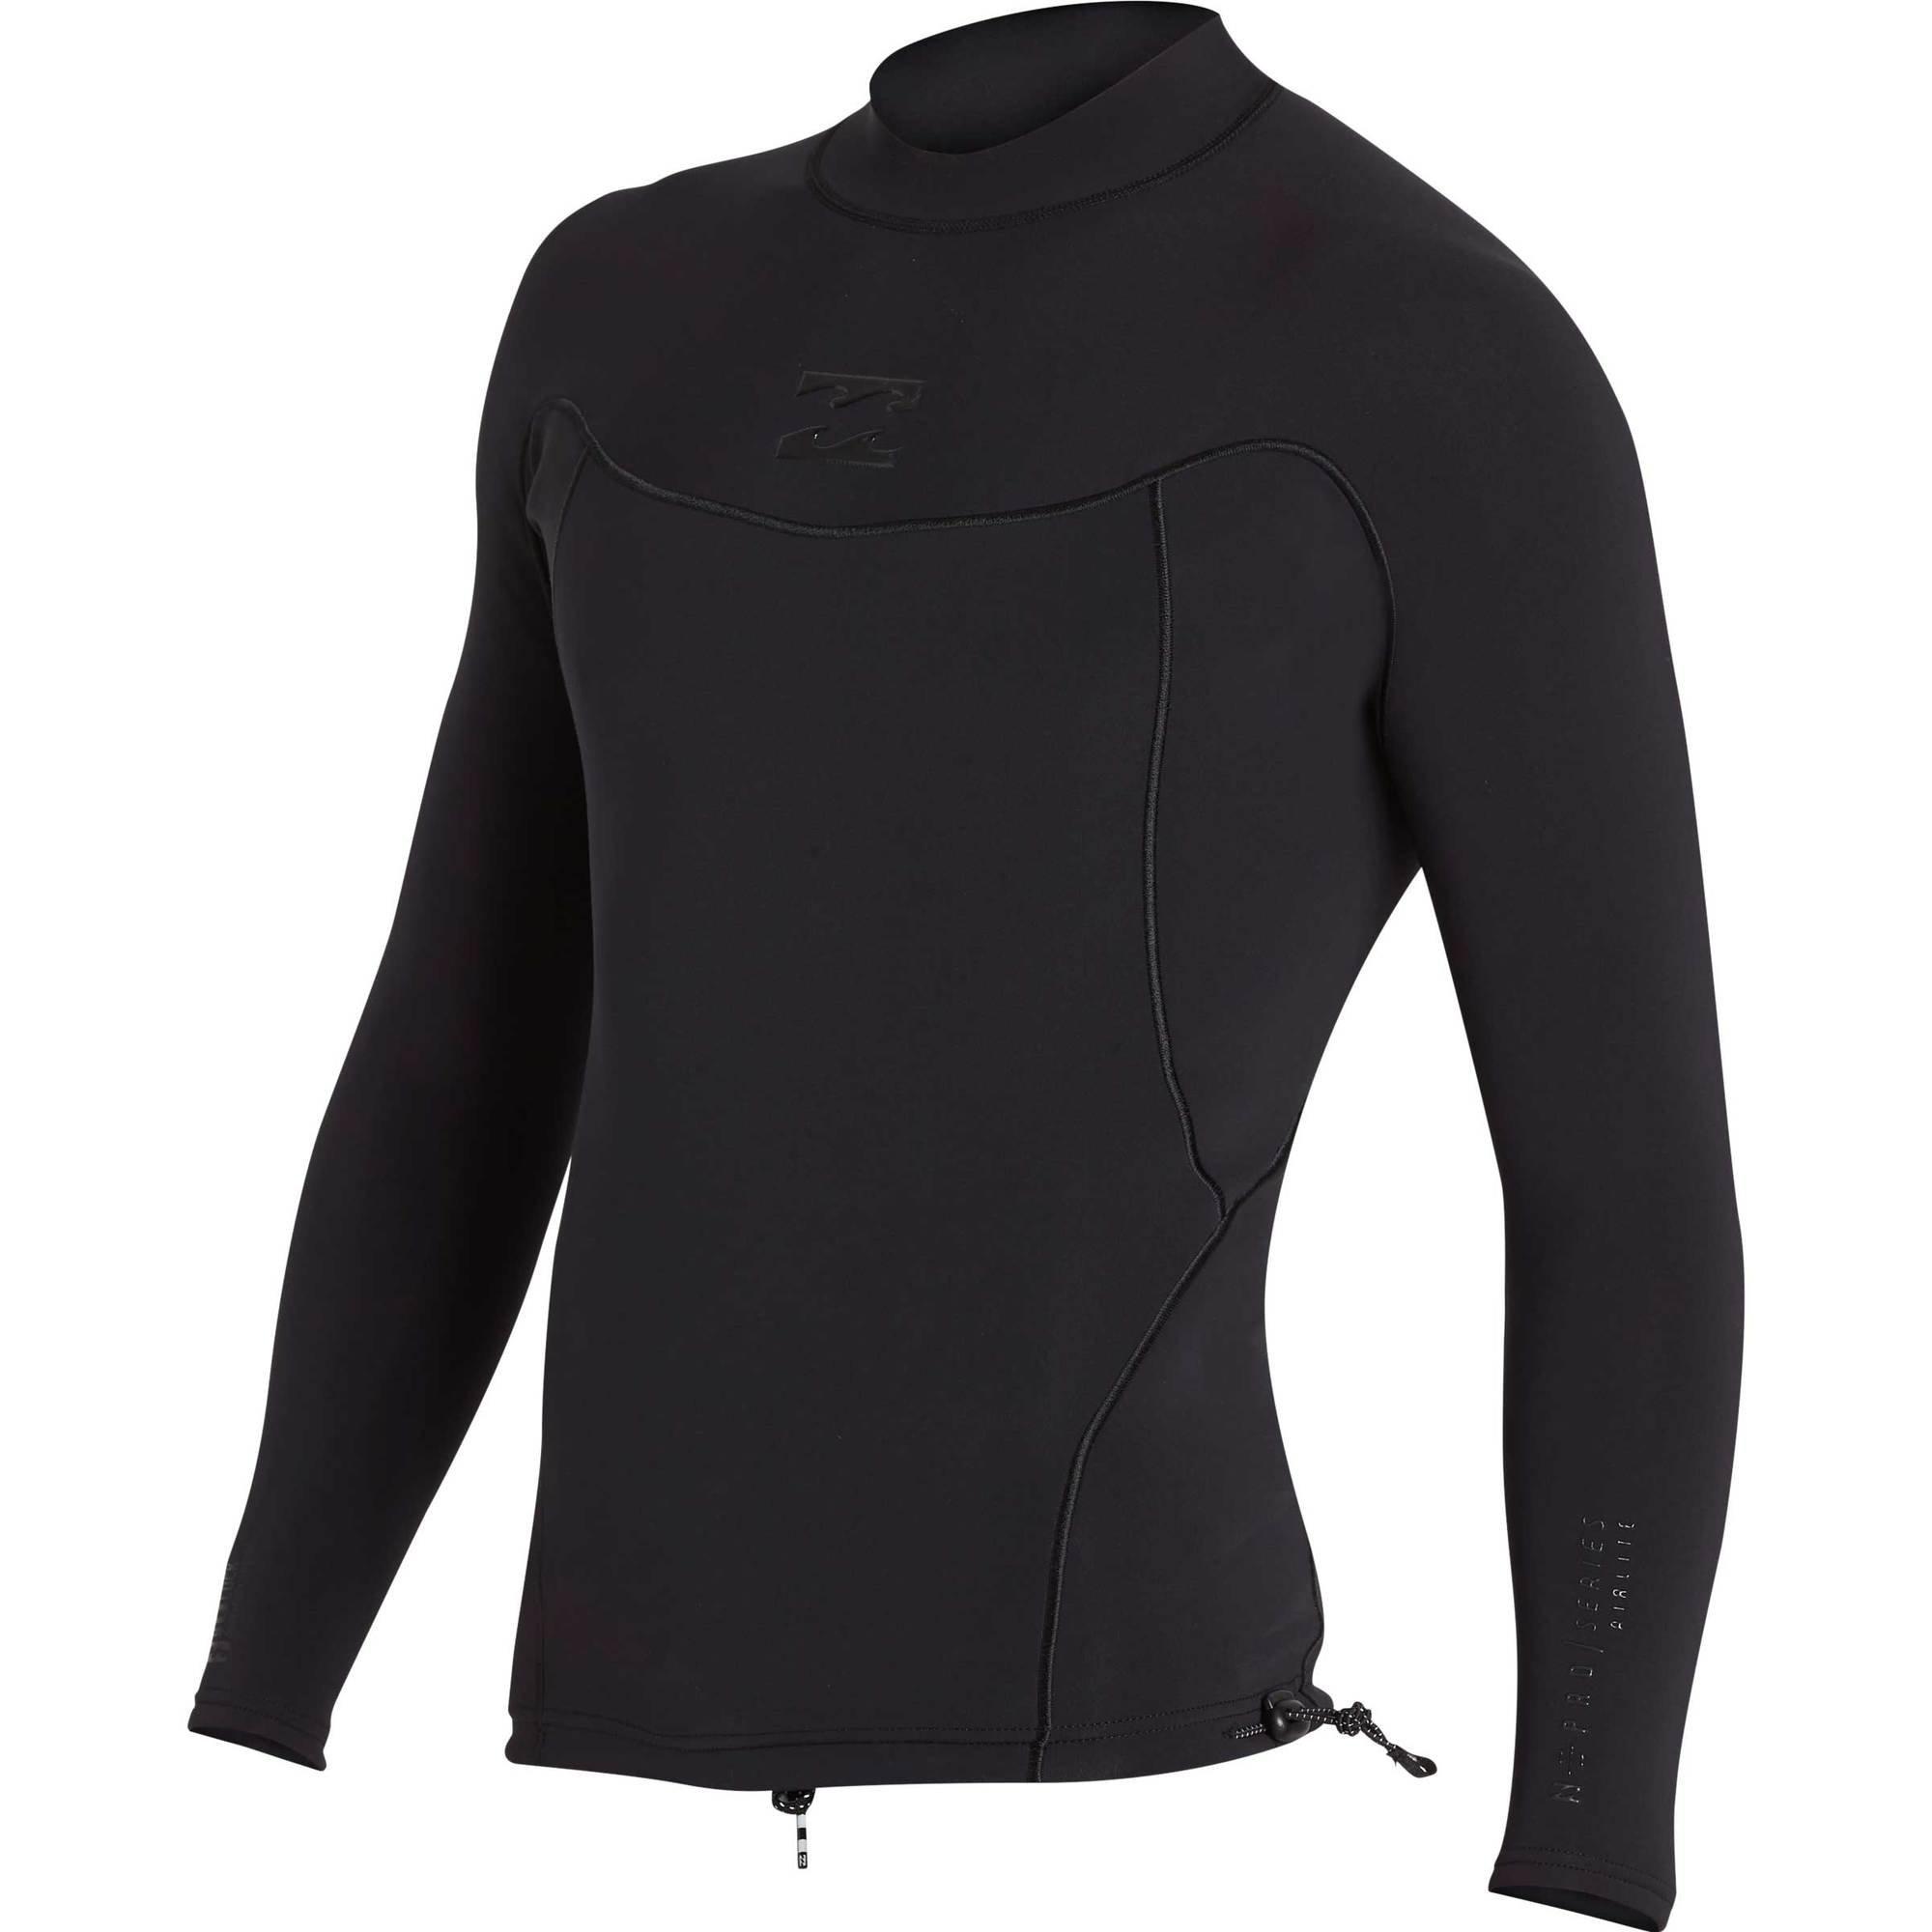 Billabong Men's 1Mm Pro Series Airlite Long Sleeve Jacket Black Heather Large